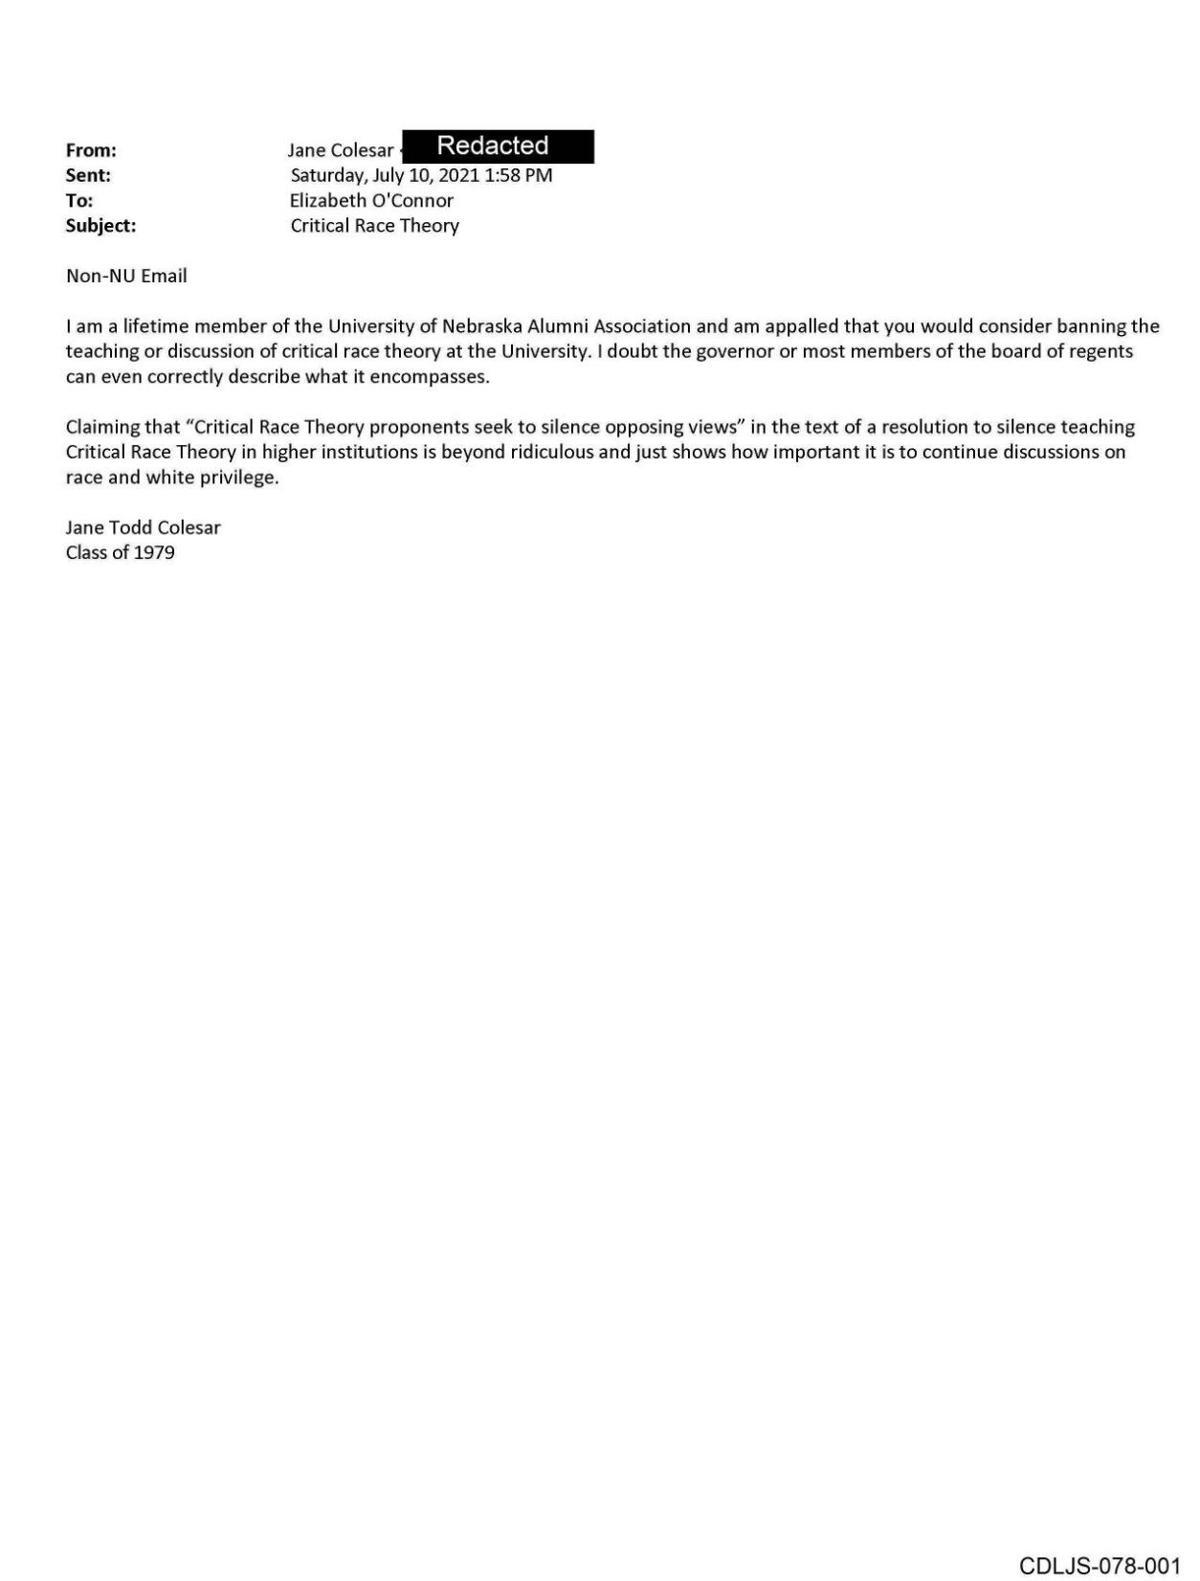 CDLJS-078-001.pdf